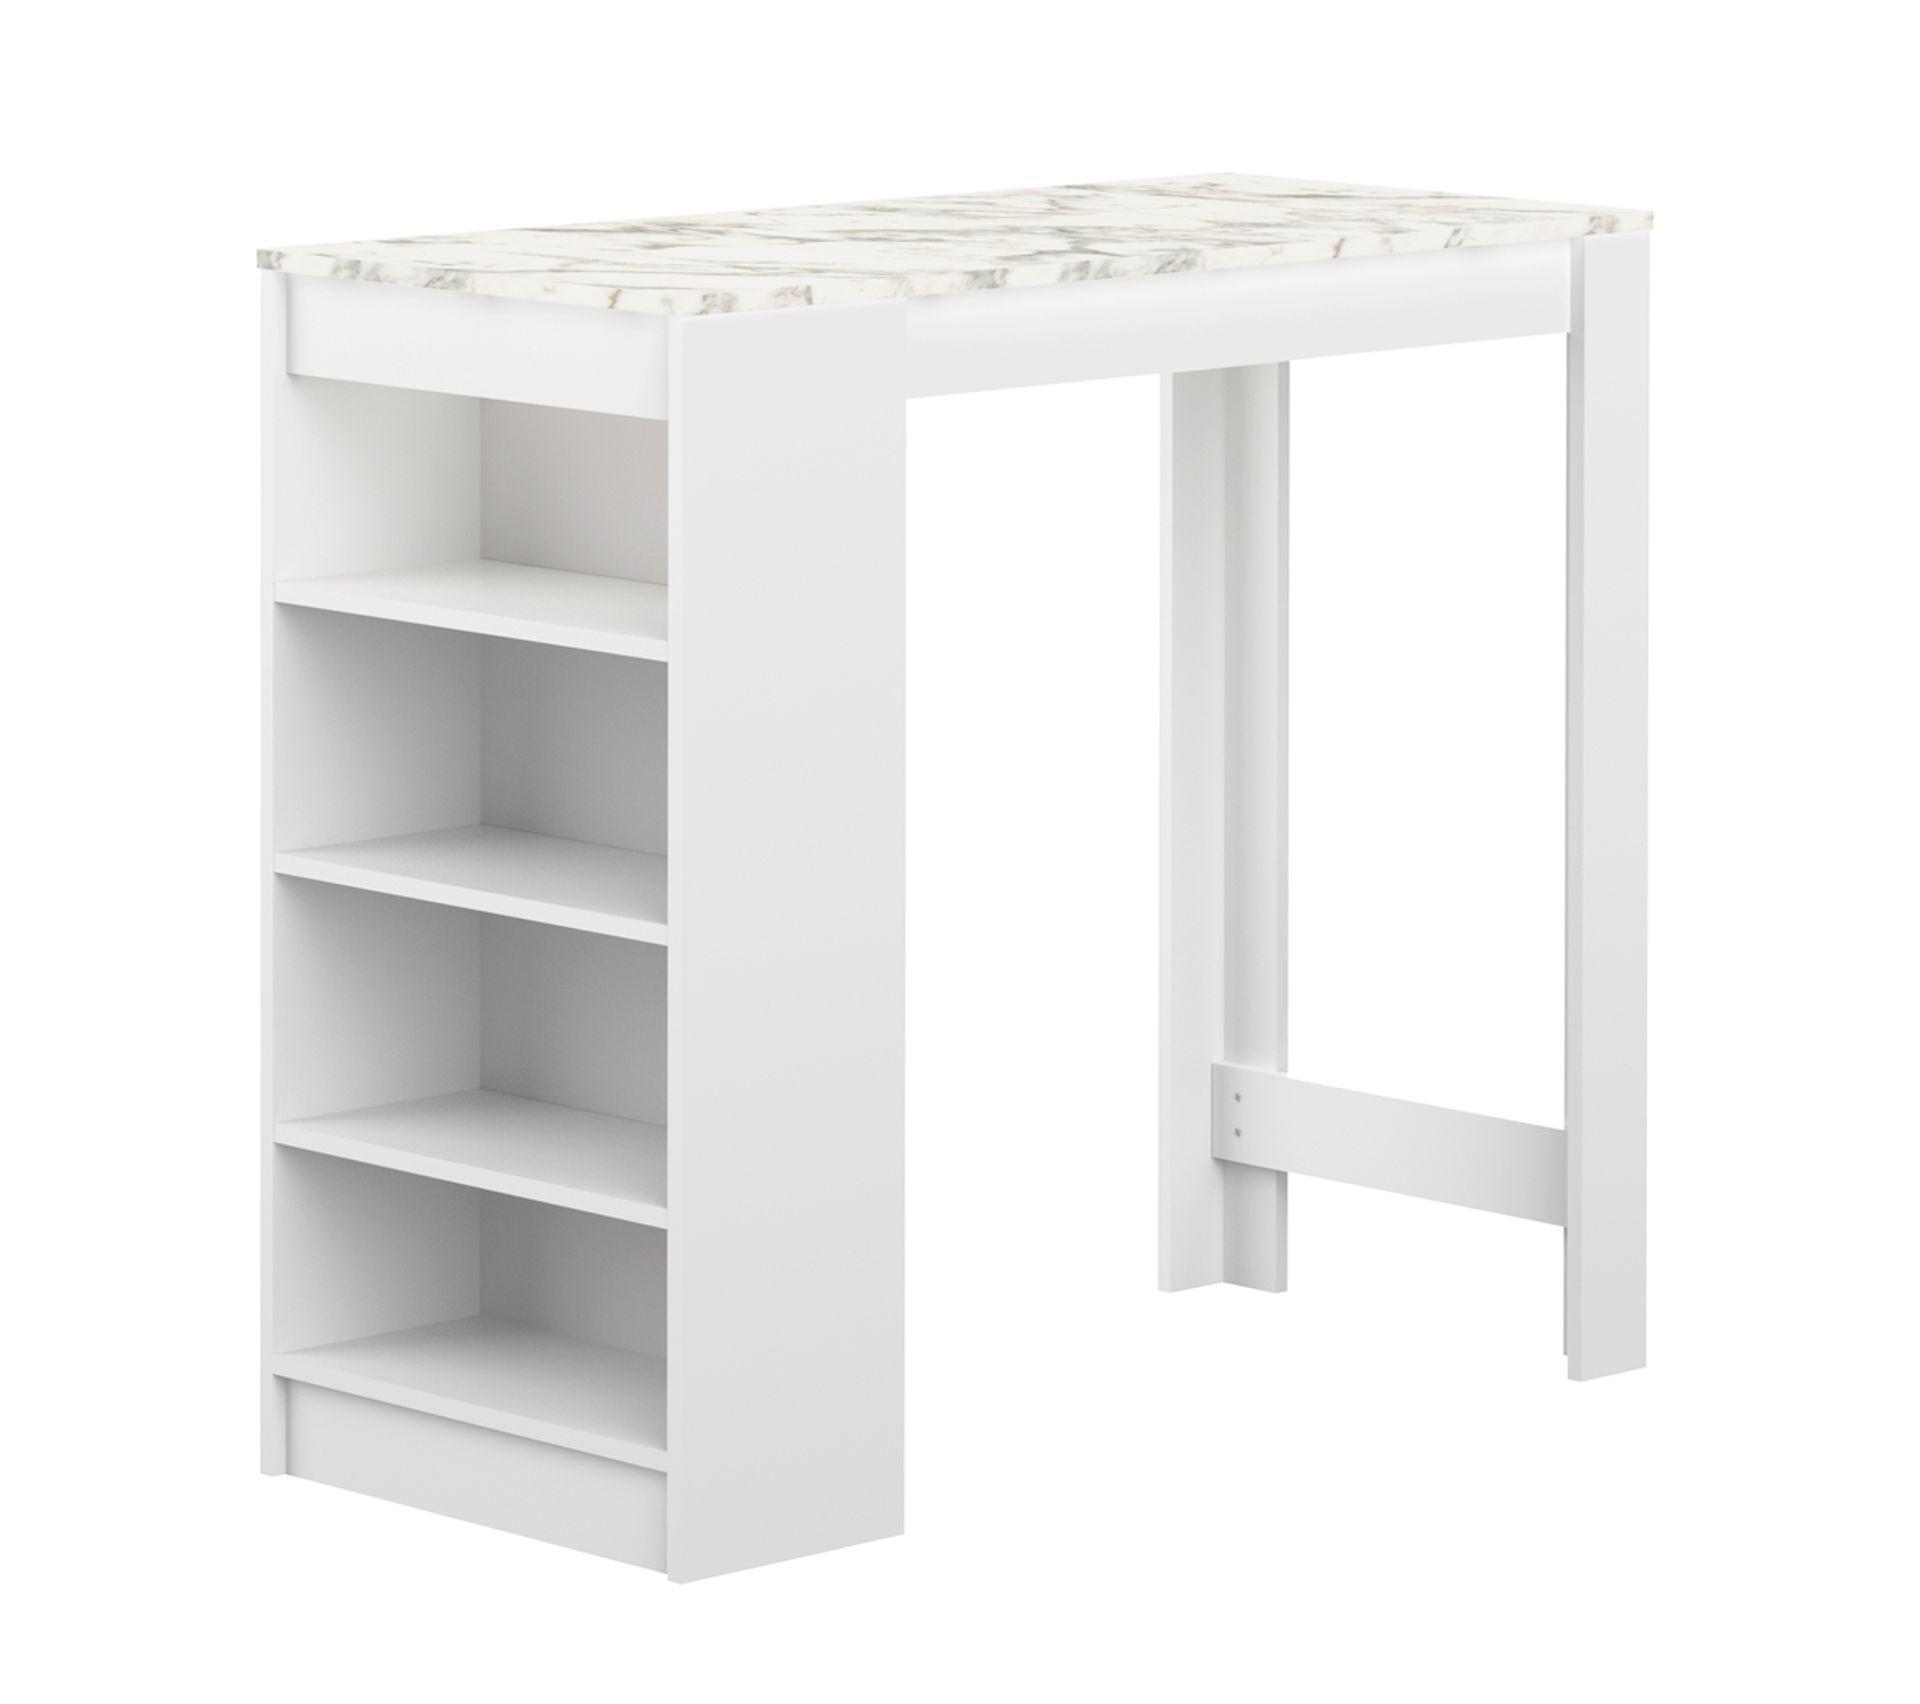 Meuble Mini Bar D Angle meuble bar aravis blanc et marbre 115 x 102,7